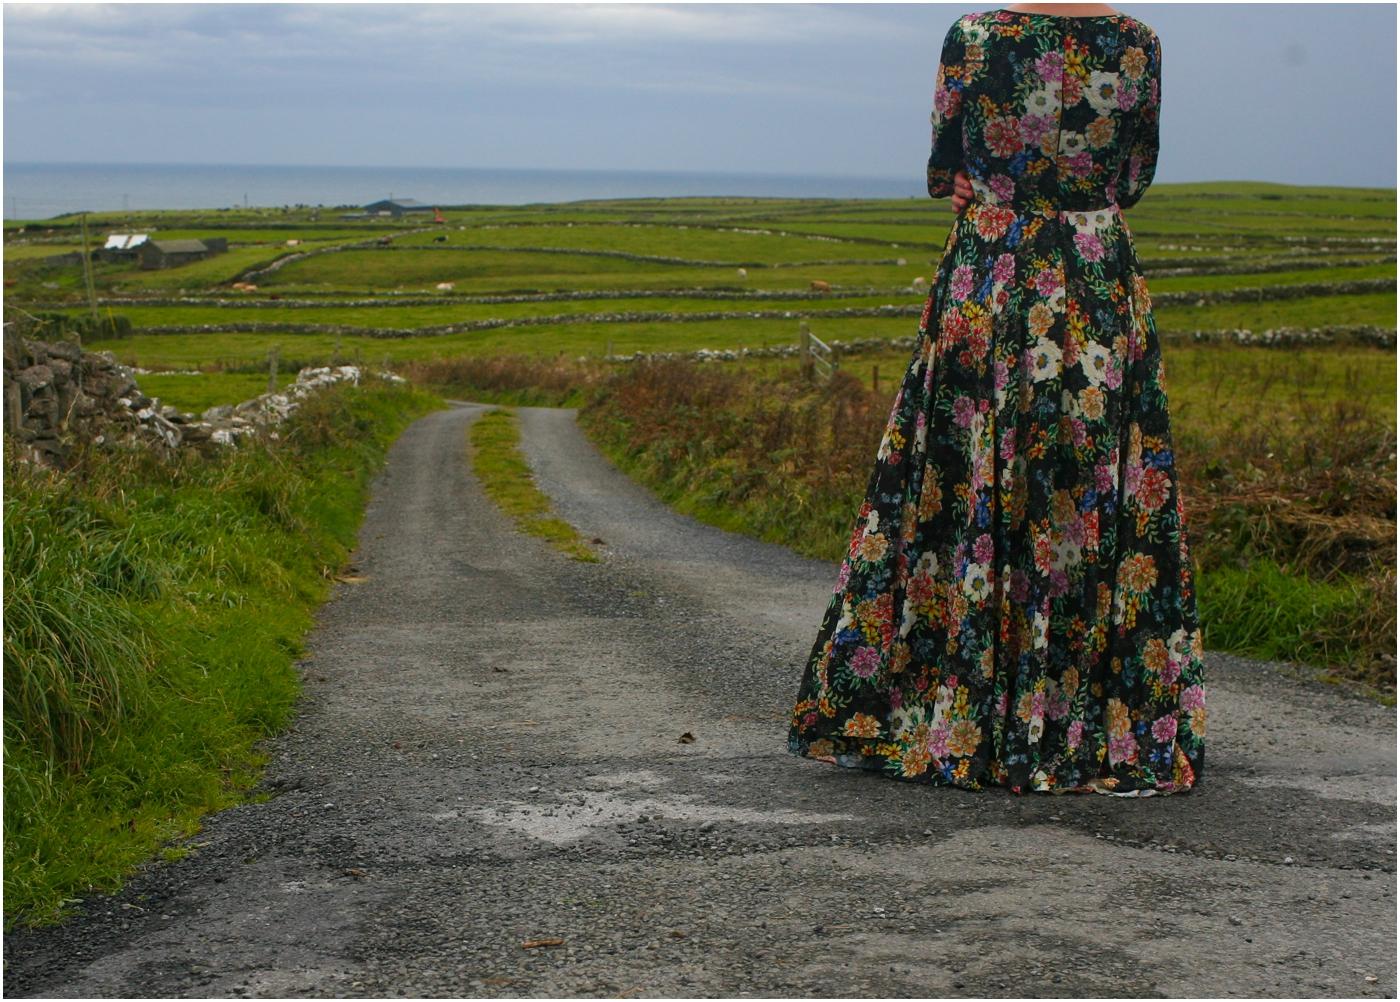 Ireland-Road-Trip-2016-9292.jpg